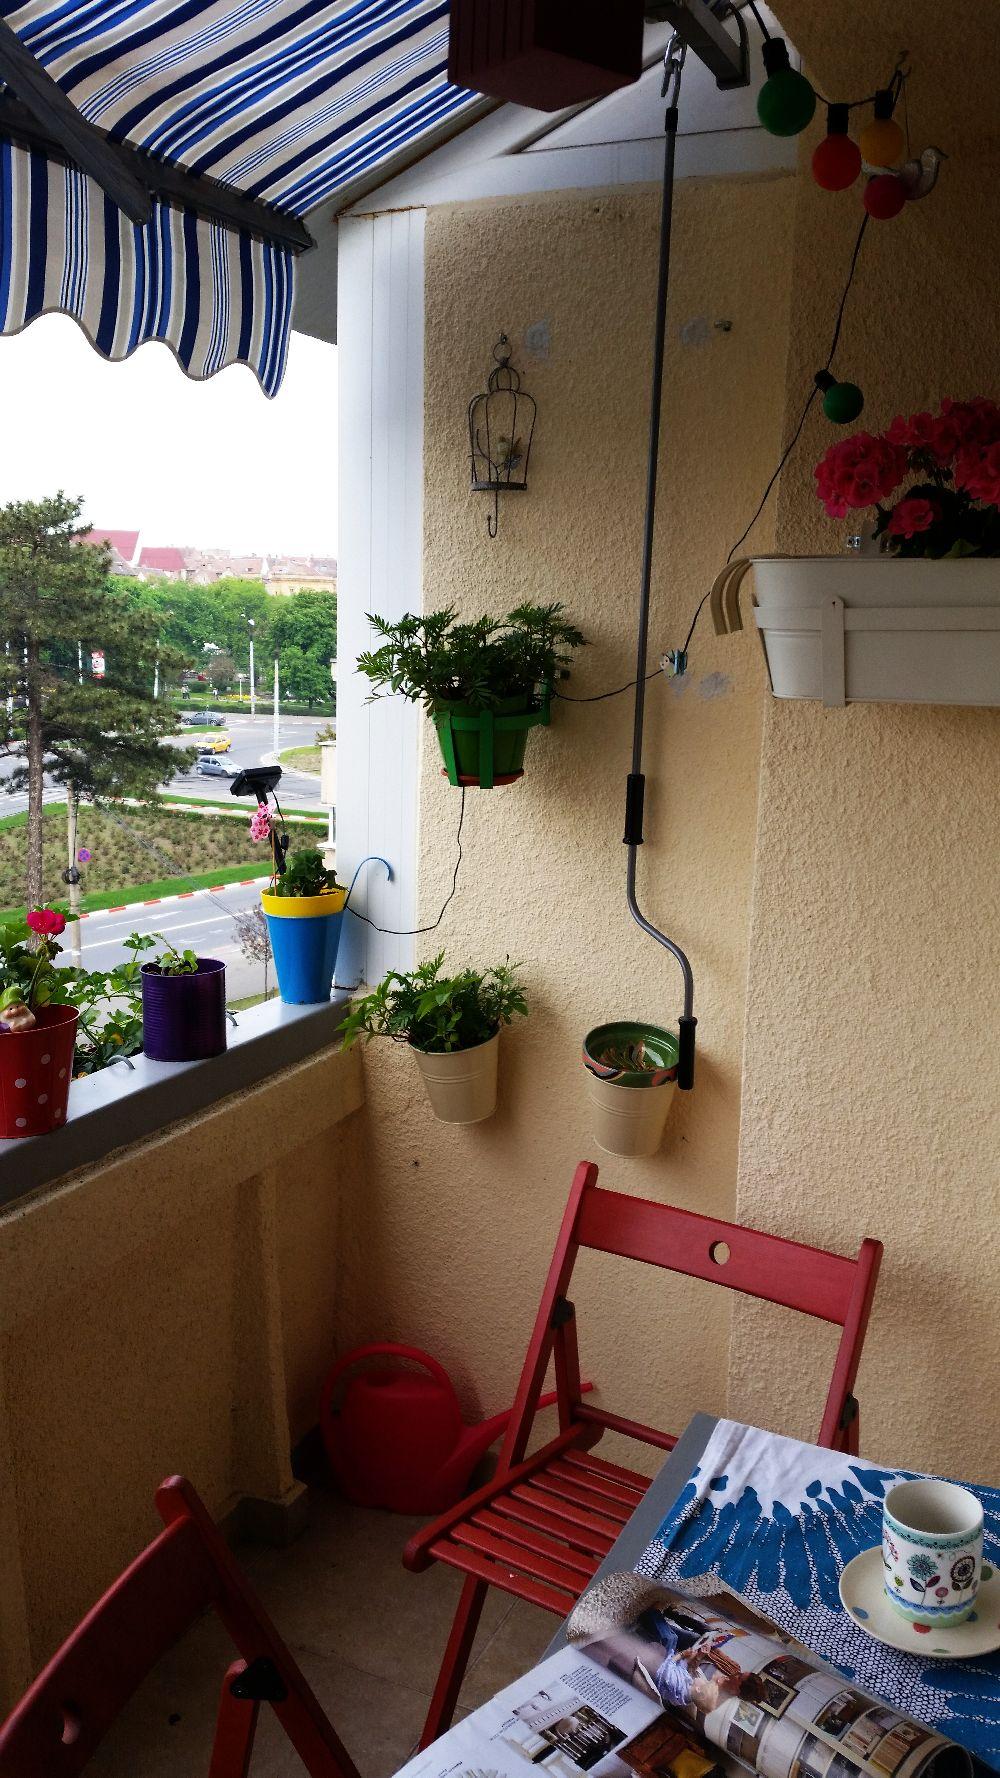 adelaparvu.com despre apartament 3 camere colorat in Sibiu, Foto Adela Parvu (35)